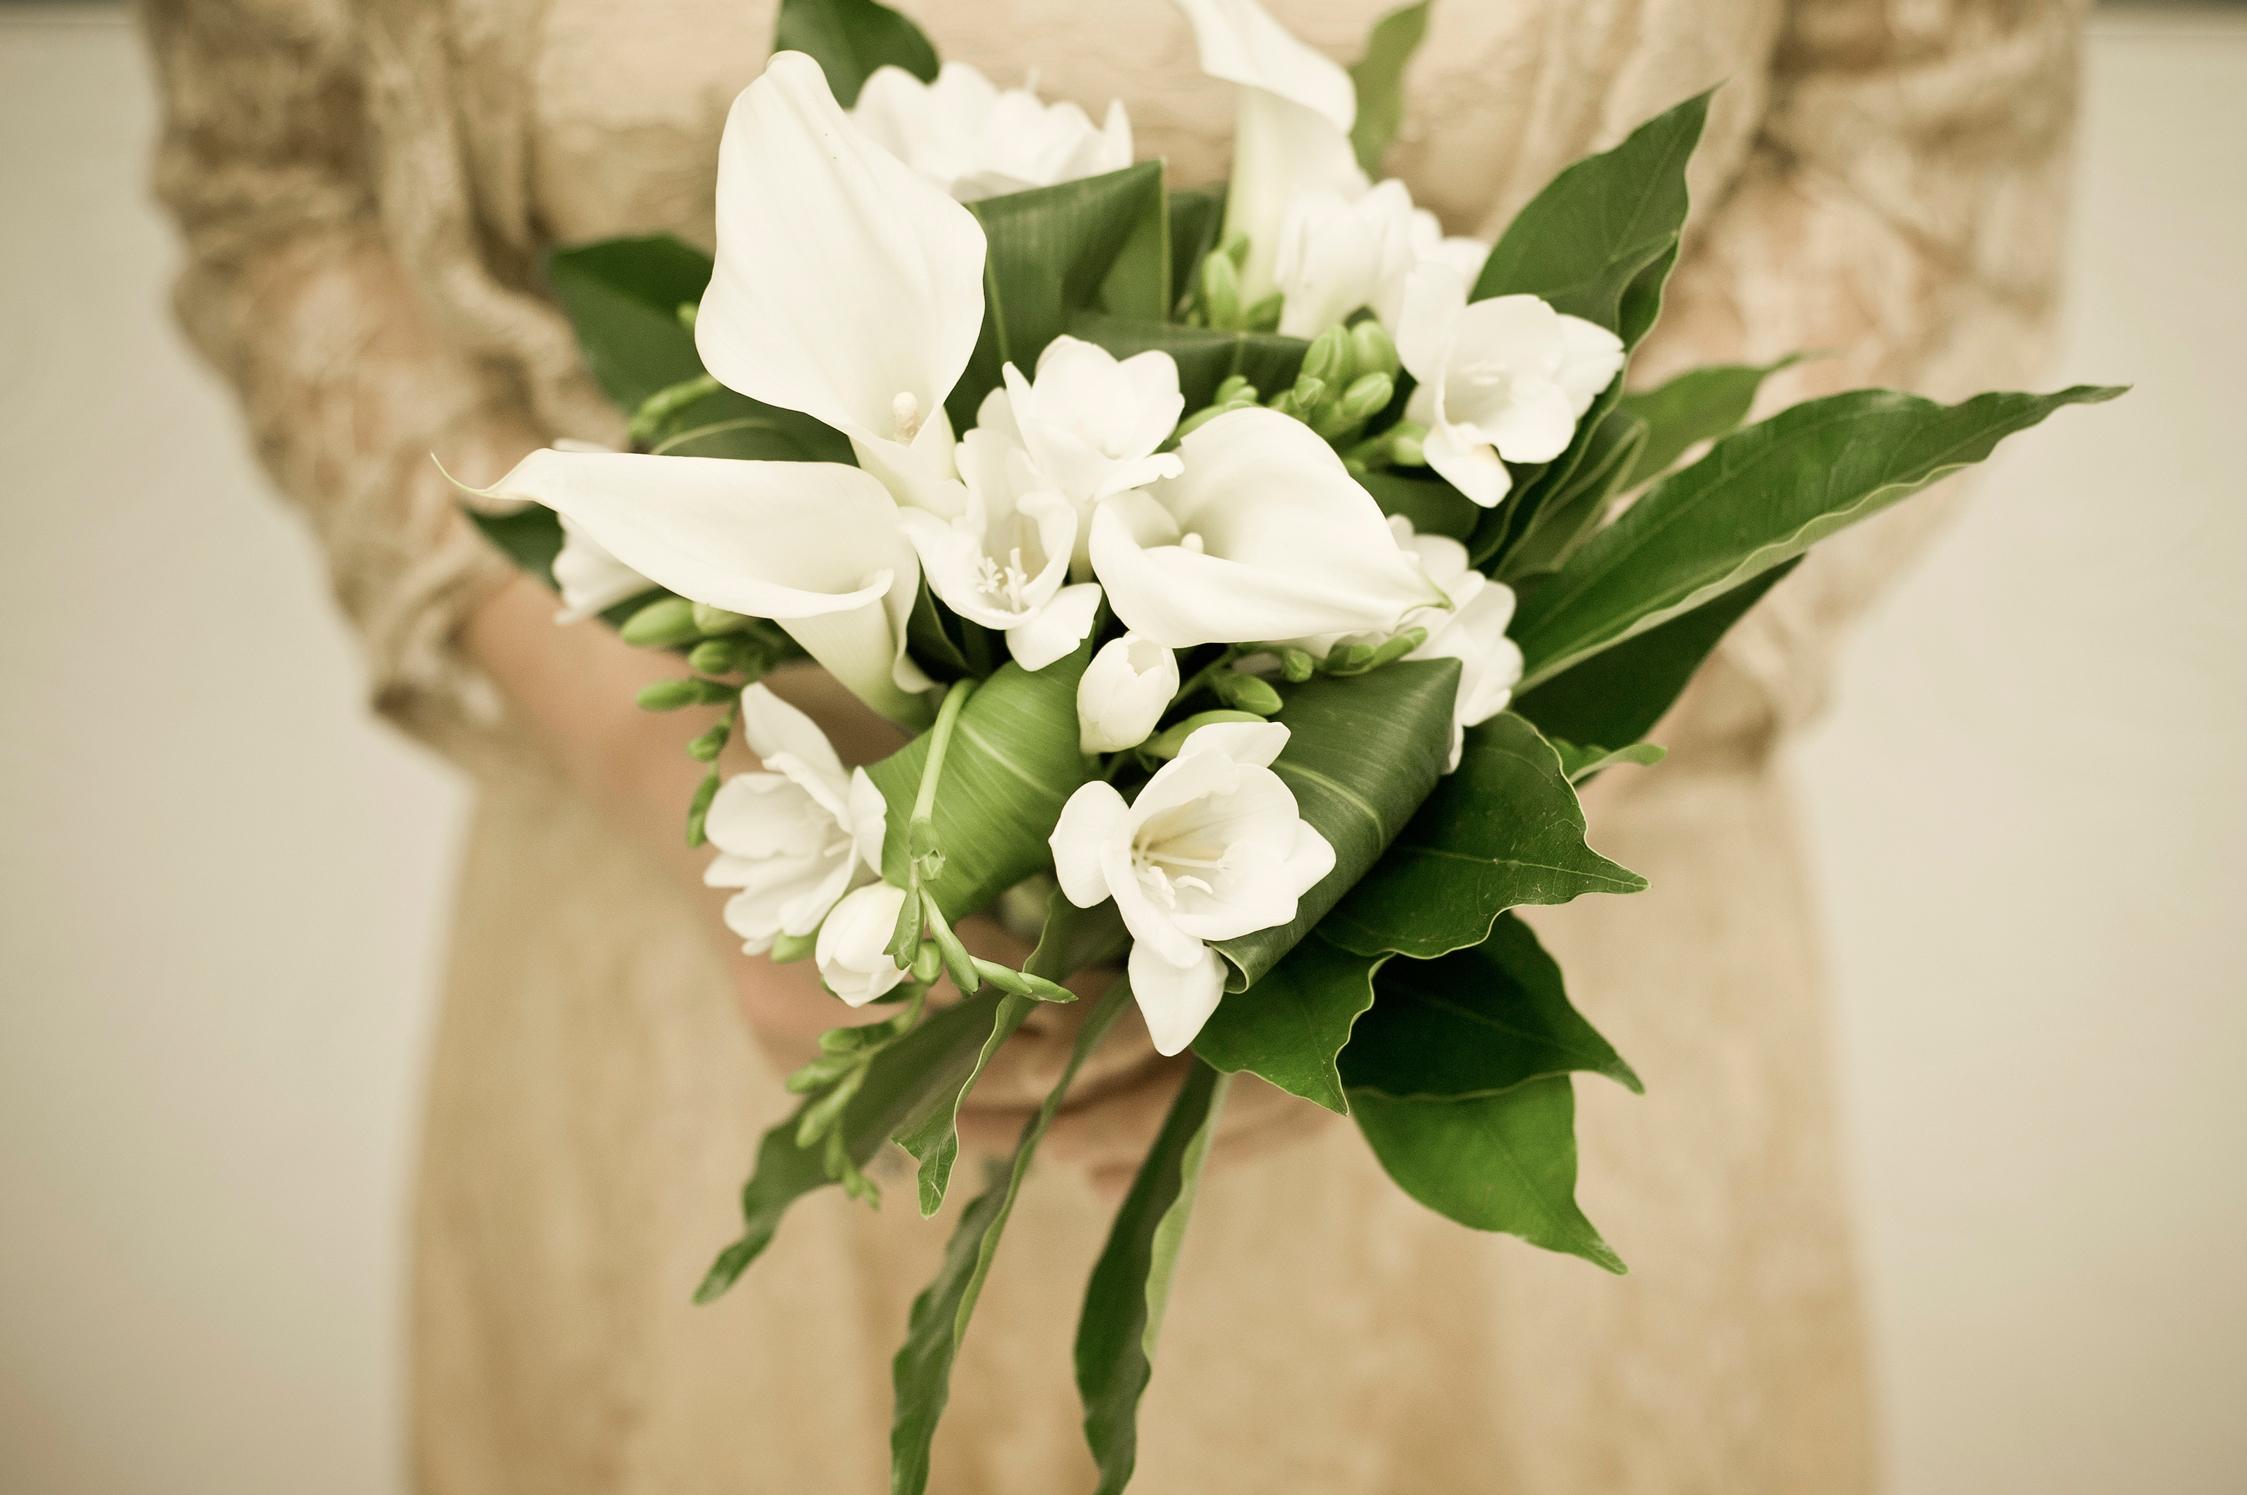 brighton_winter_wedding_02.jpg